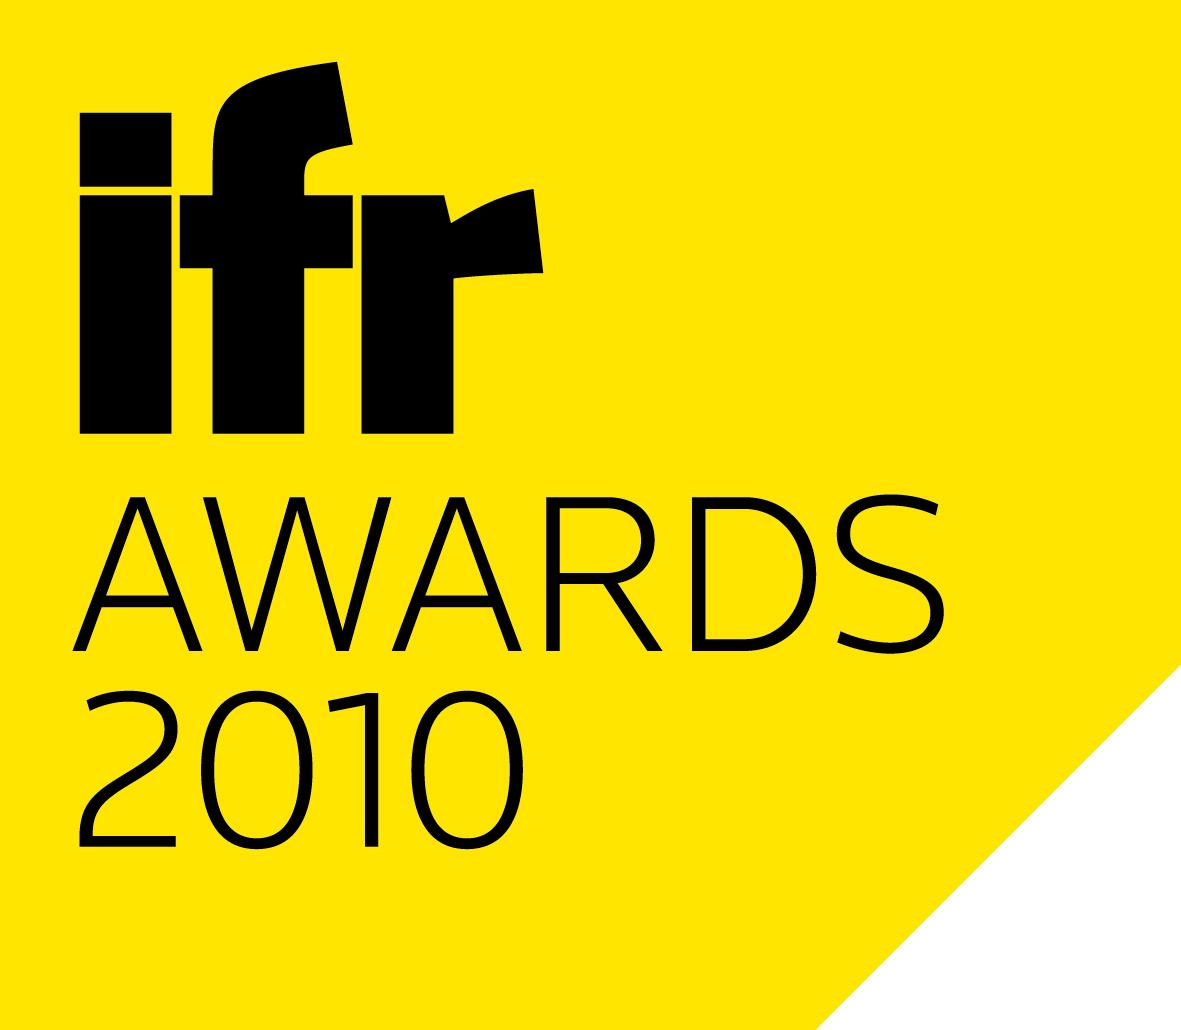 download the ifr awards logo ifr americas awards 2016